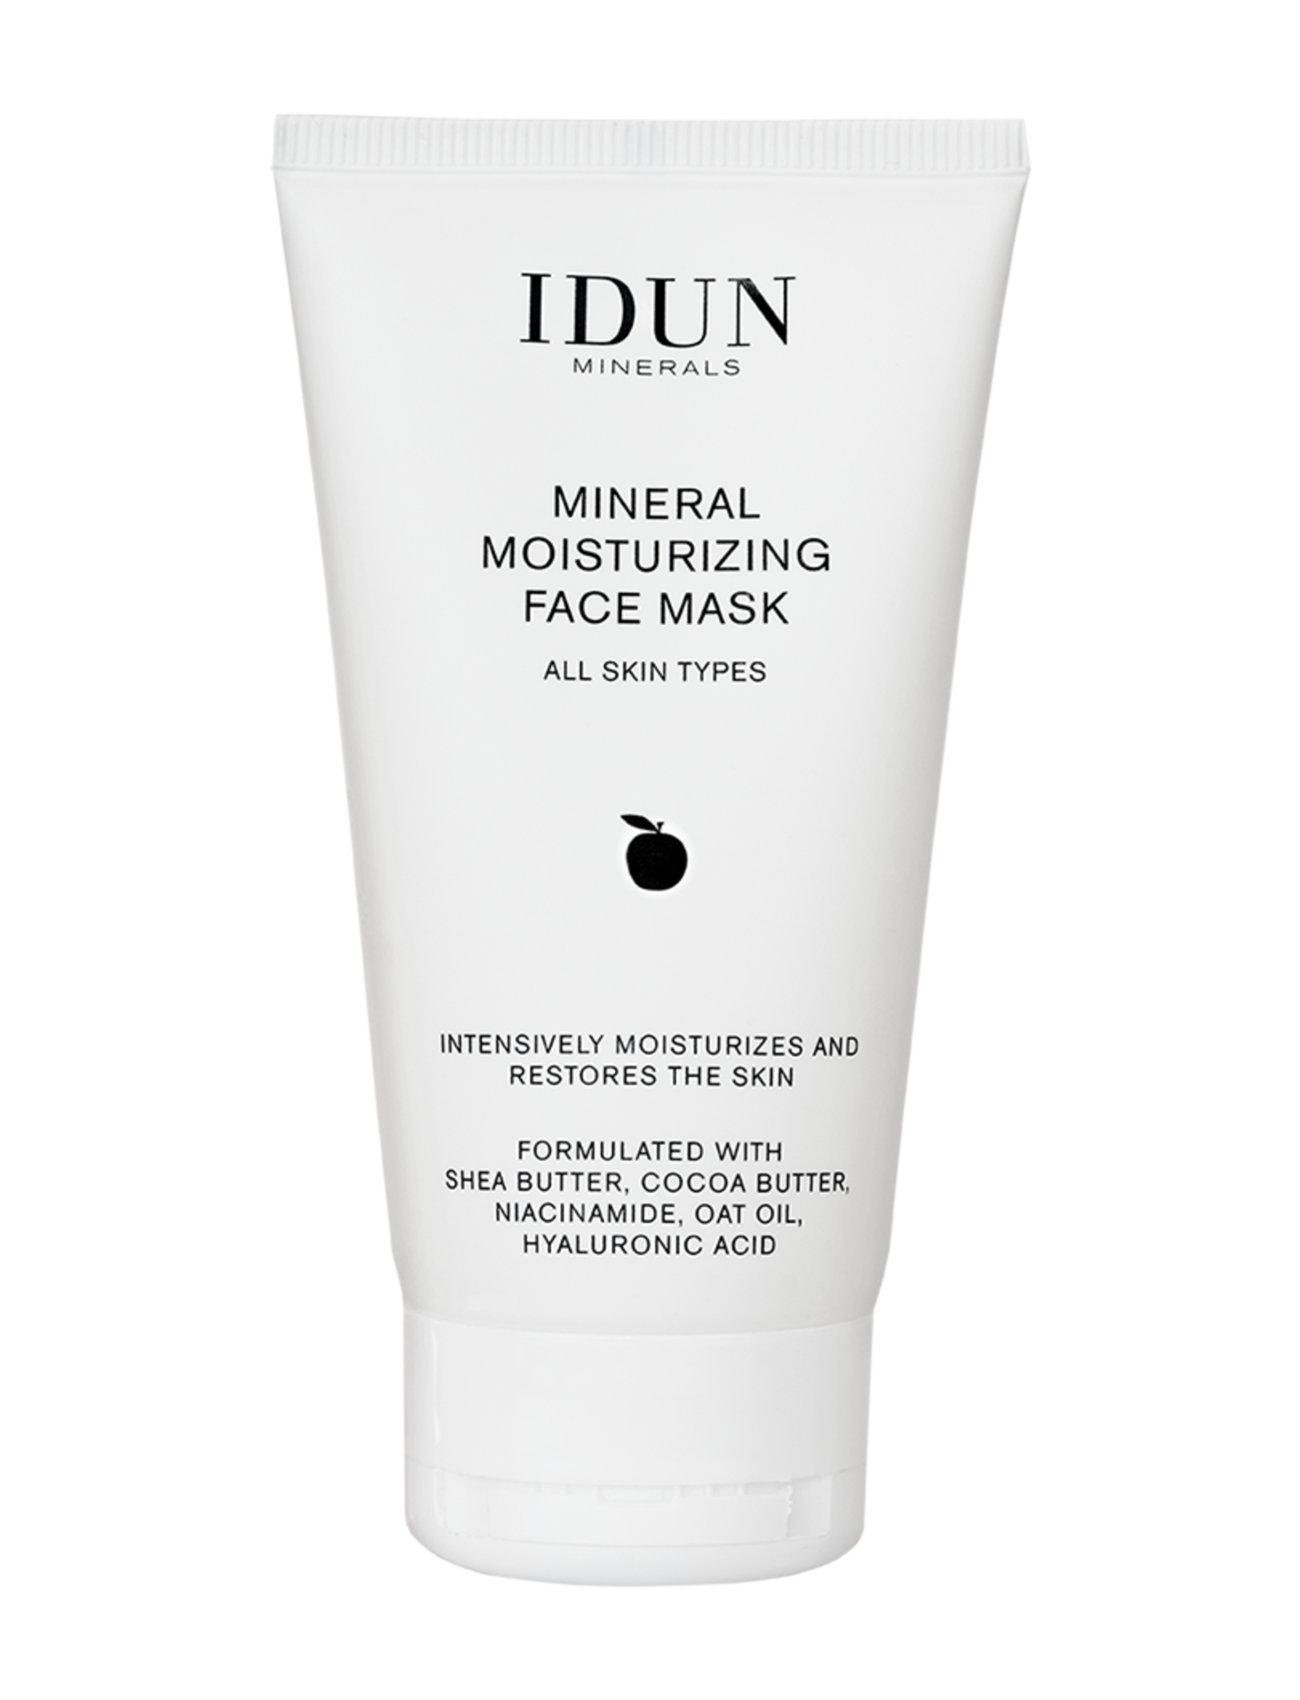 Image of Moisturizing Face Mask Beauty WOMEN Skin Care Face Face Masks Nude IDUN Minerals (3425930243)